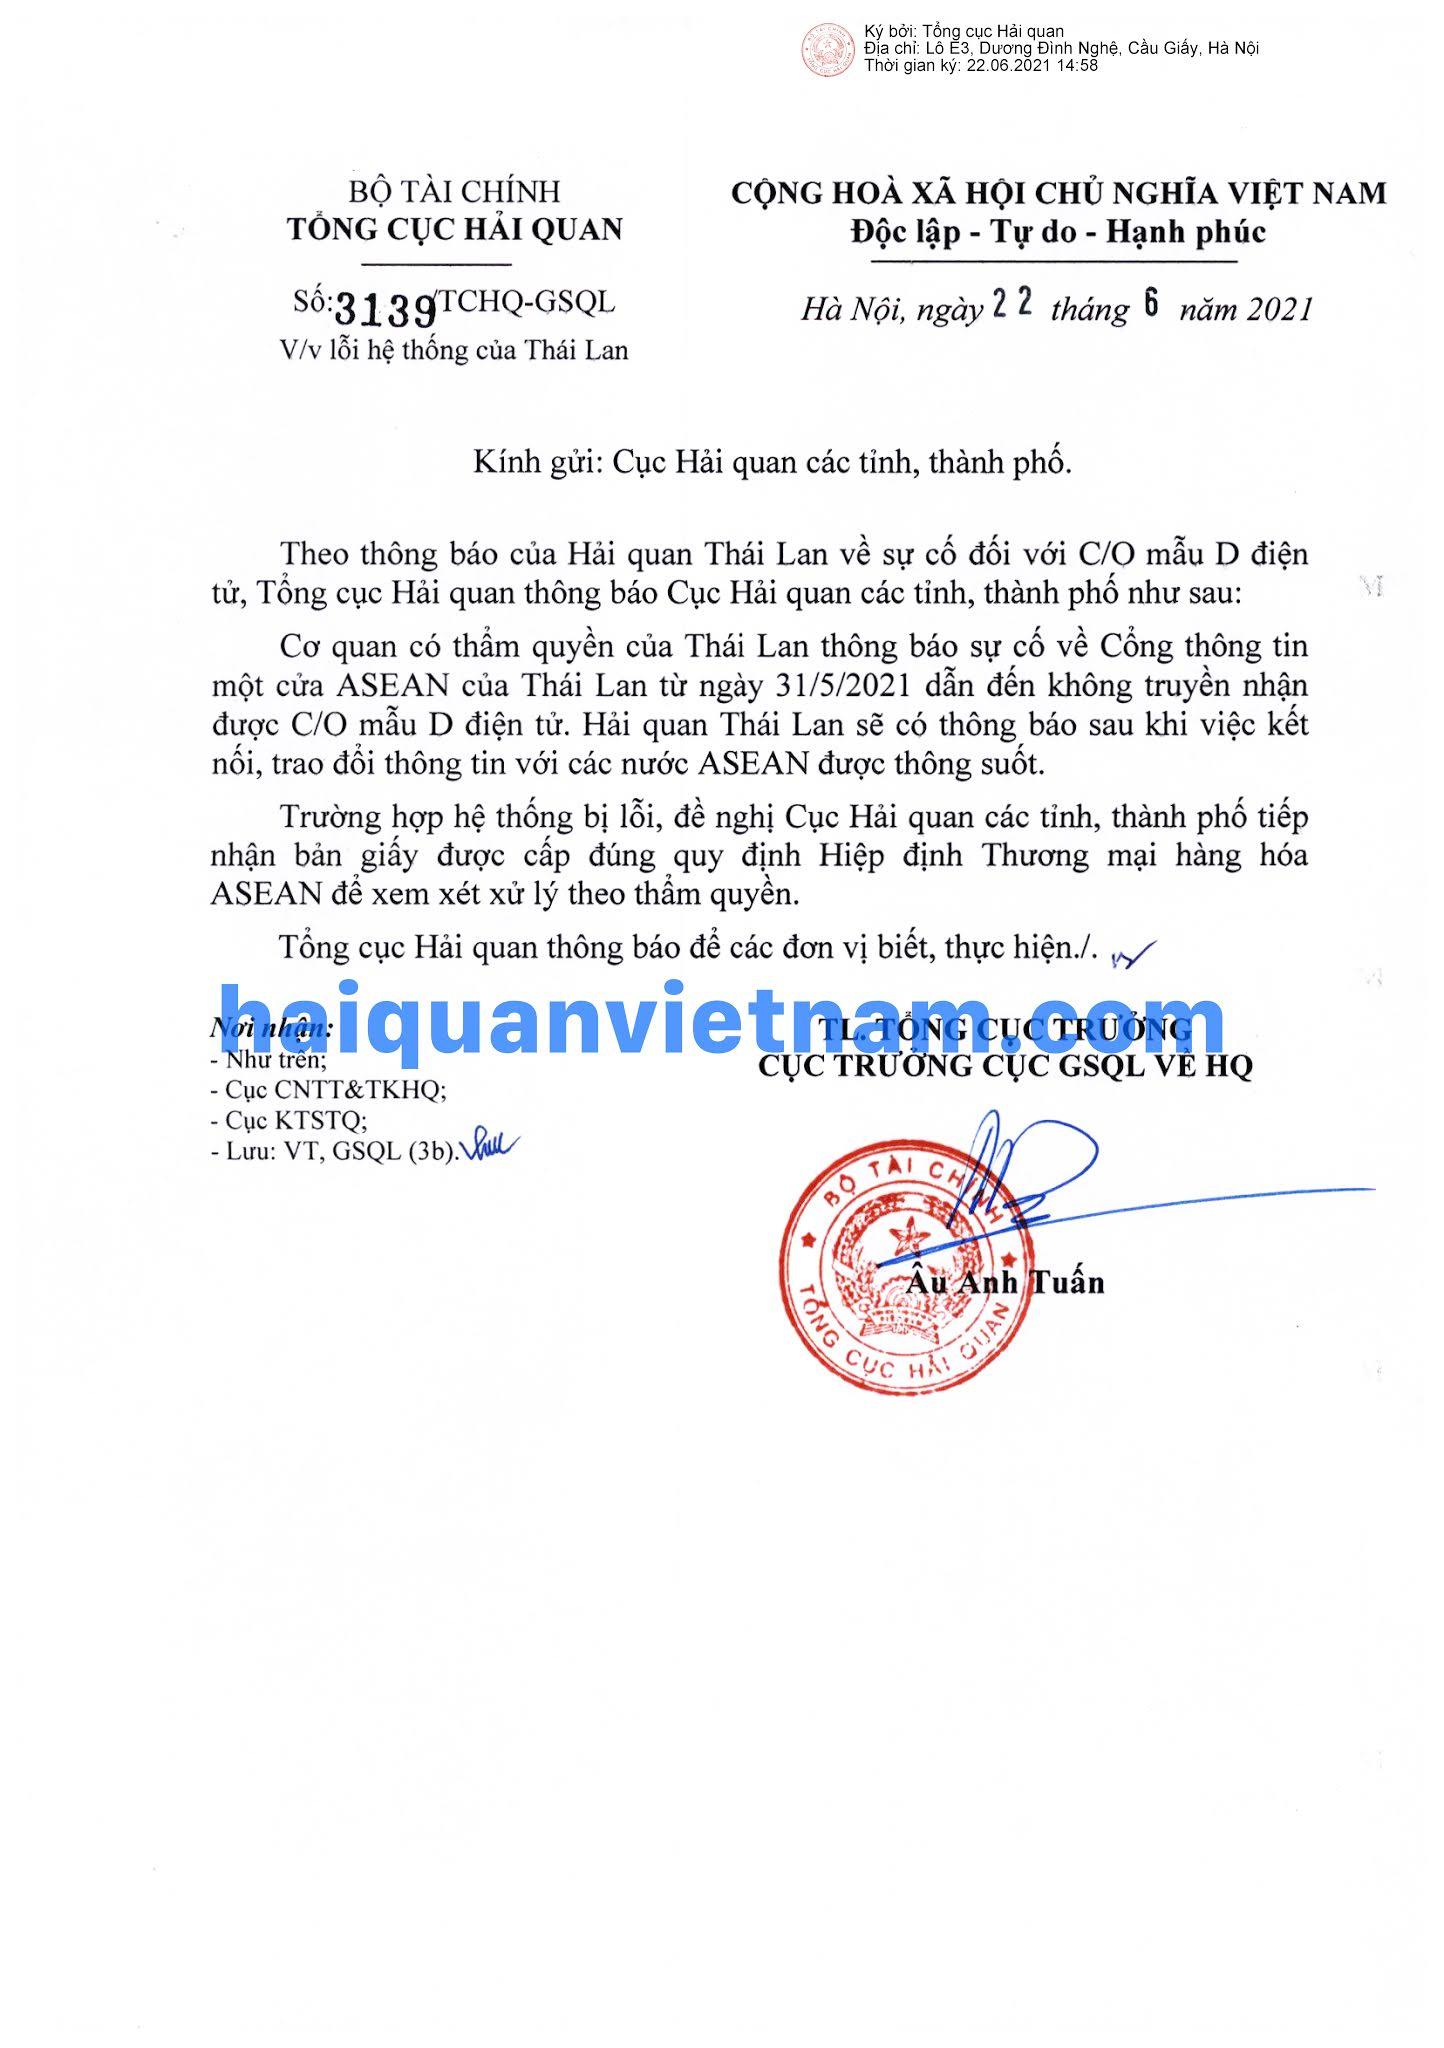 [Image: 210622_3139_TCHQ-GSQL_haiquanvietnam_01.jpg]